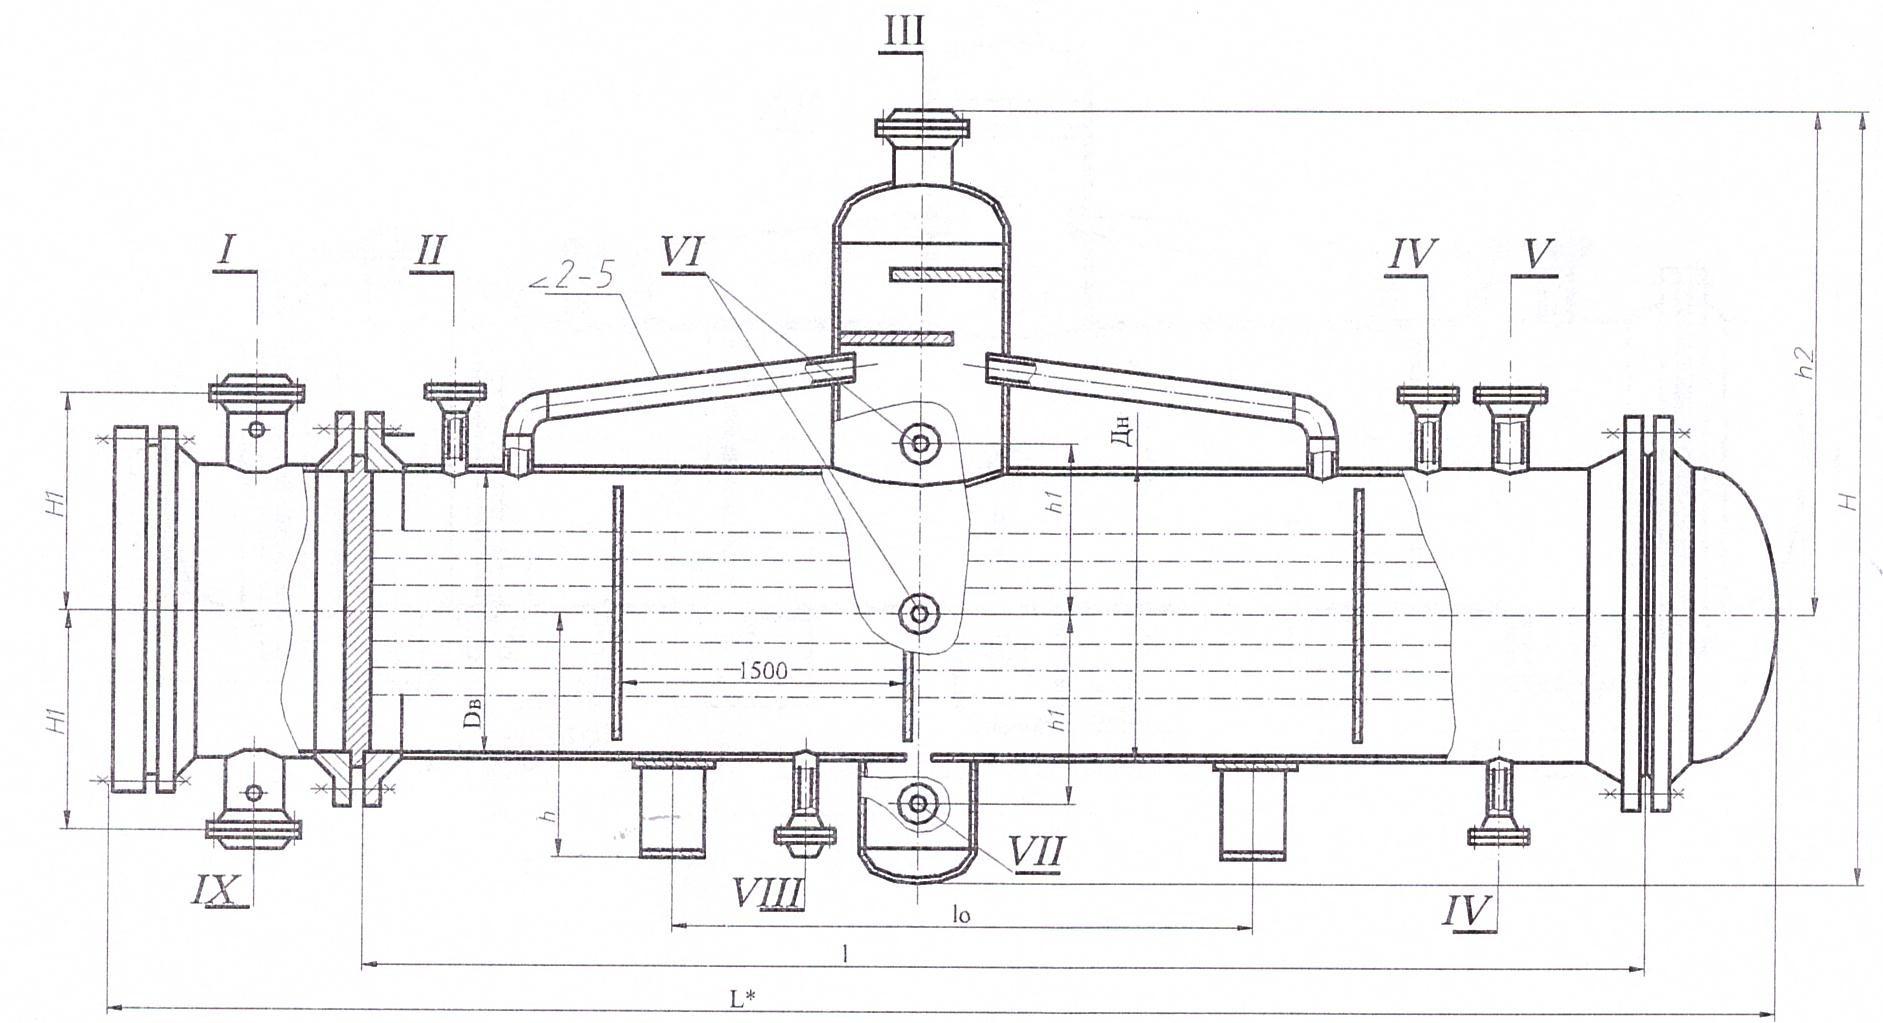 Кожухотрубчатые испарители типа ИХ Тамбов Промывочная установка Pump Eliminate 30 v4v Сарапул